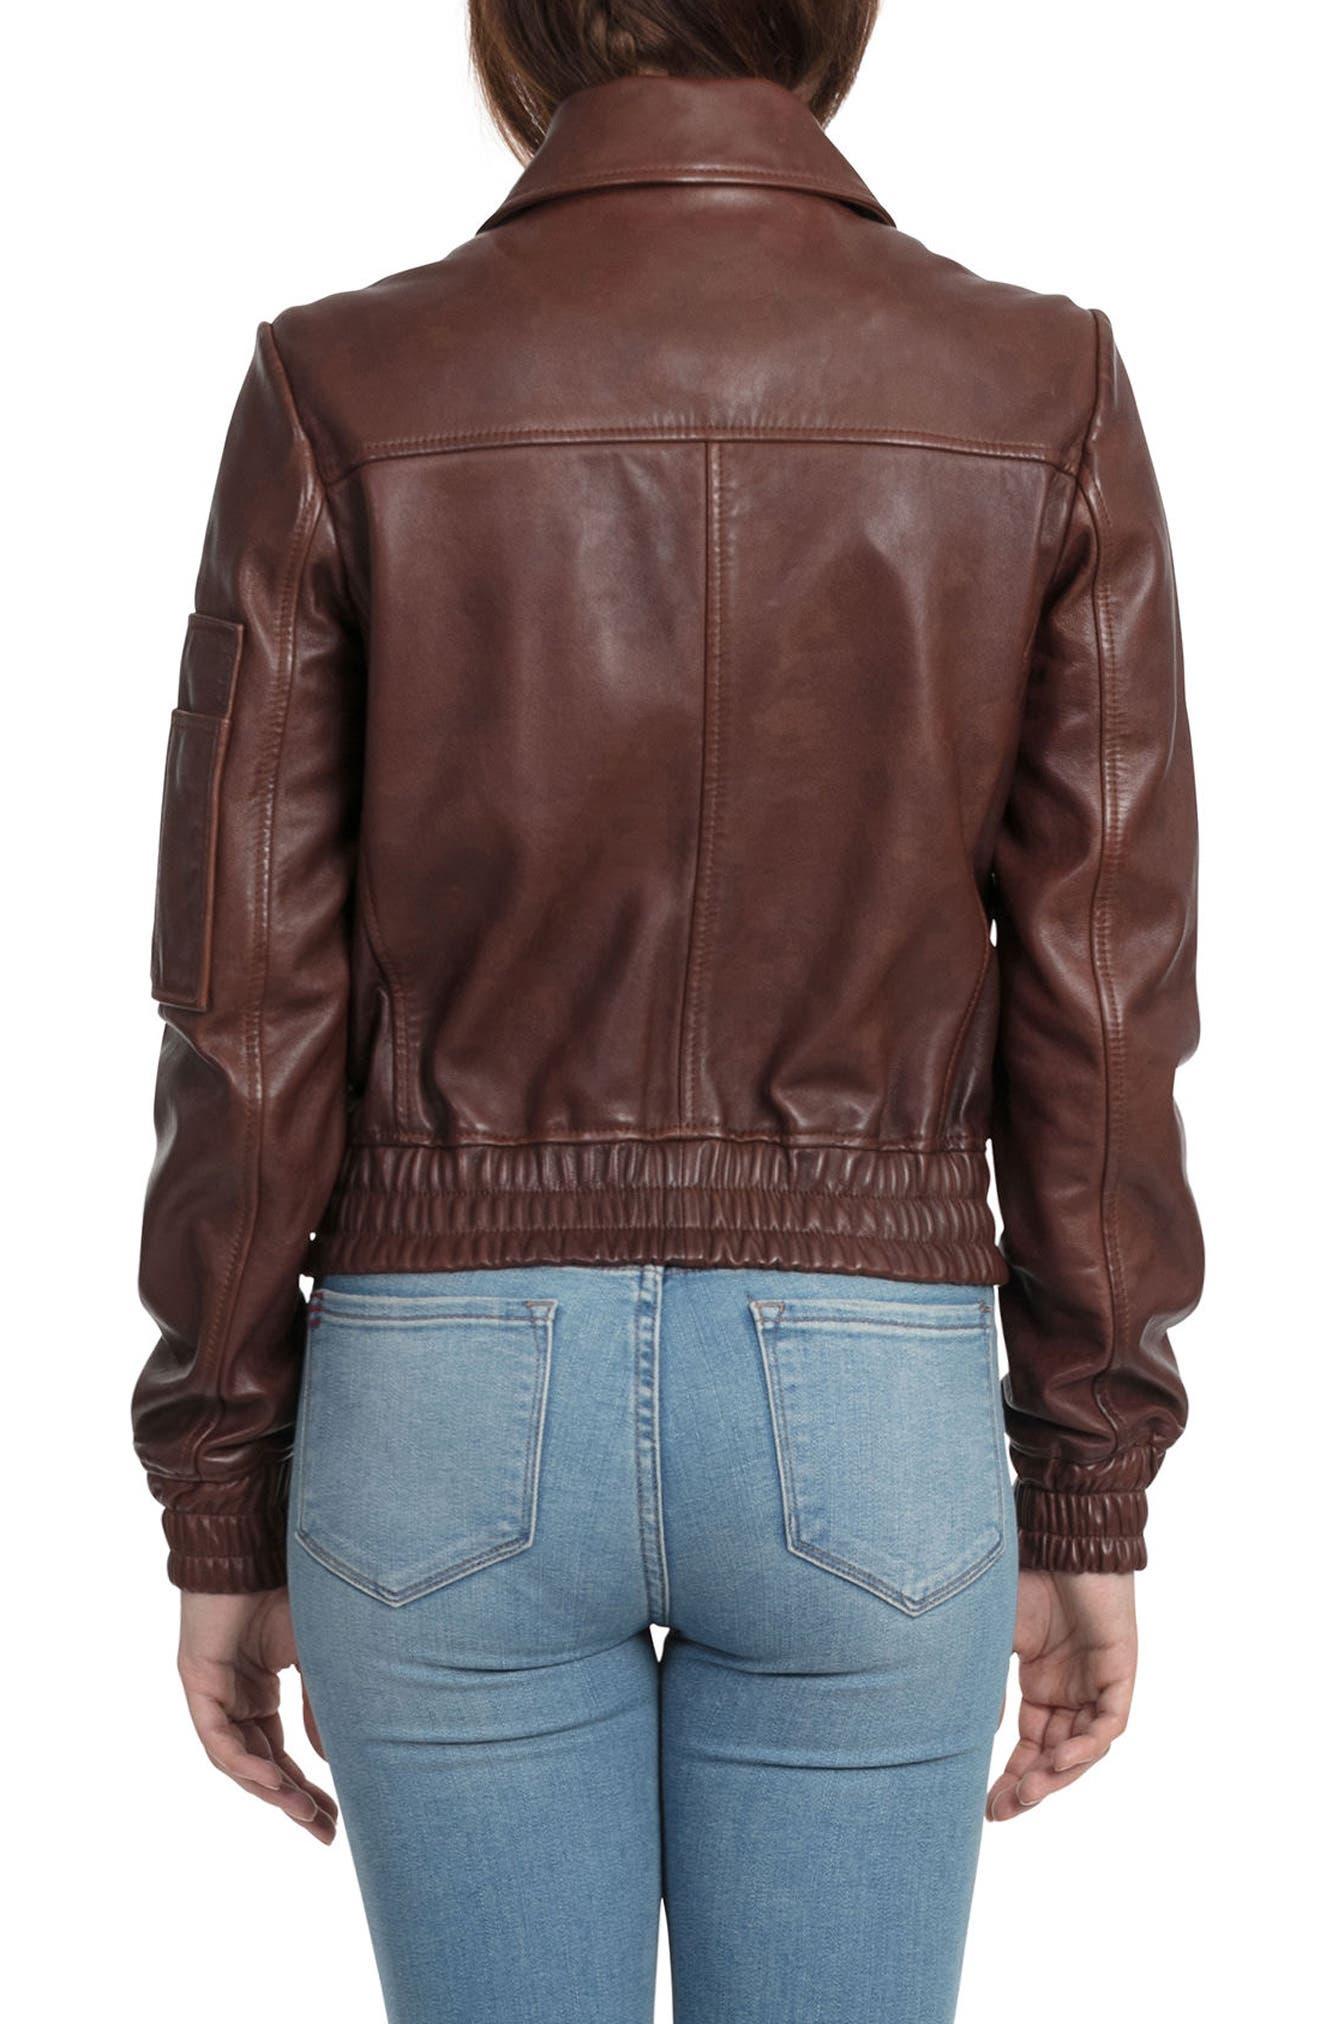 BAGATELLE.CITY The Aviator Leather Jacket,                             Alternate thumbnail 2, color,                             201